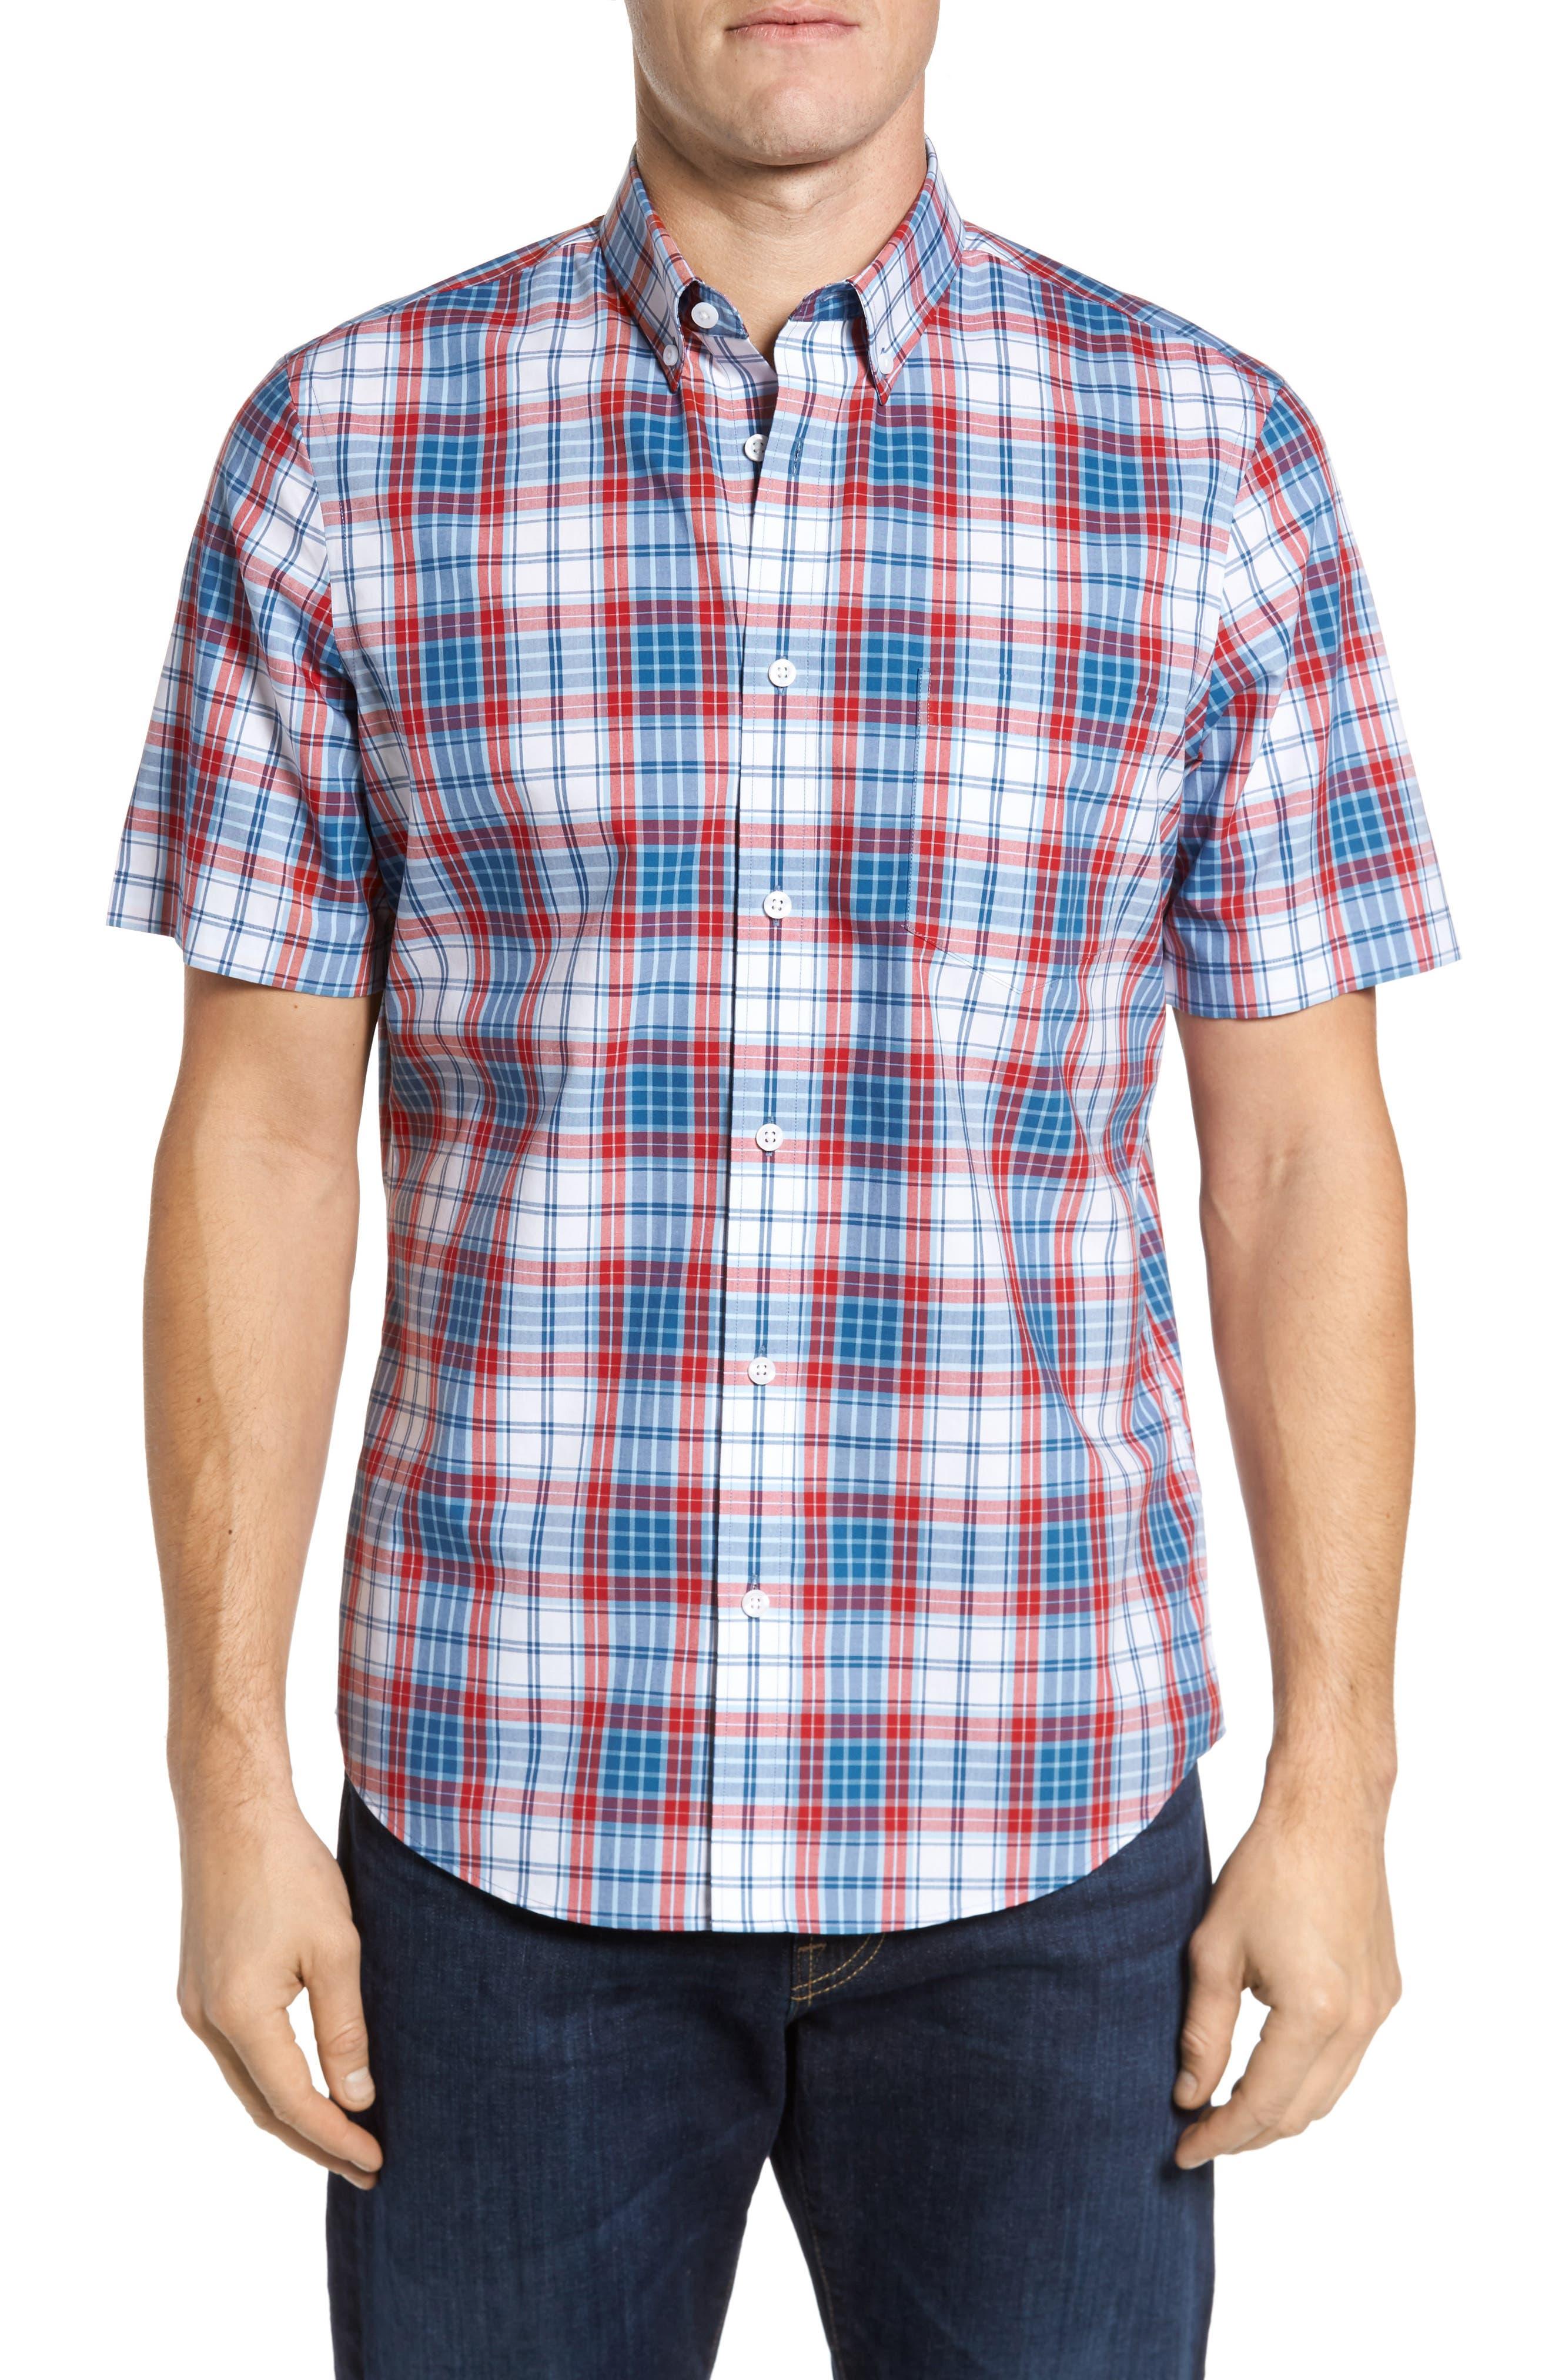 Smartcare<sup>™</sup> Regular Fit Plaid Sport Shirt,                         Main,                         color, White Red Heather Tartan